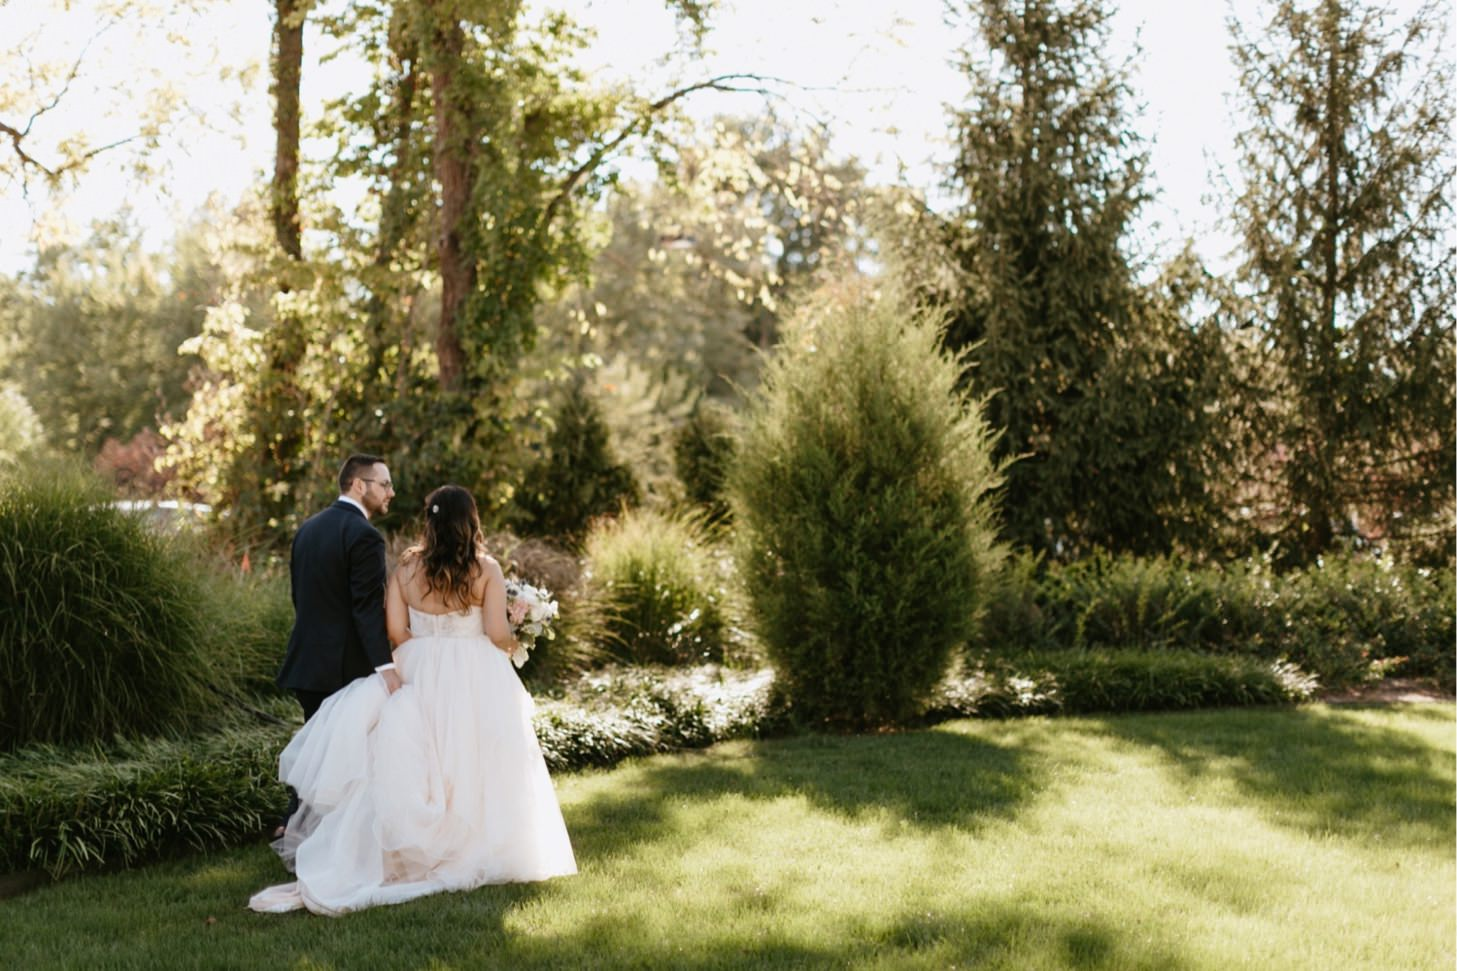 ritz-charles-wedding-reception-downtown-indianapolis-wedding-photographer011.JPG